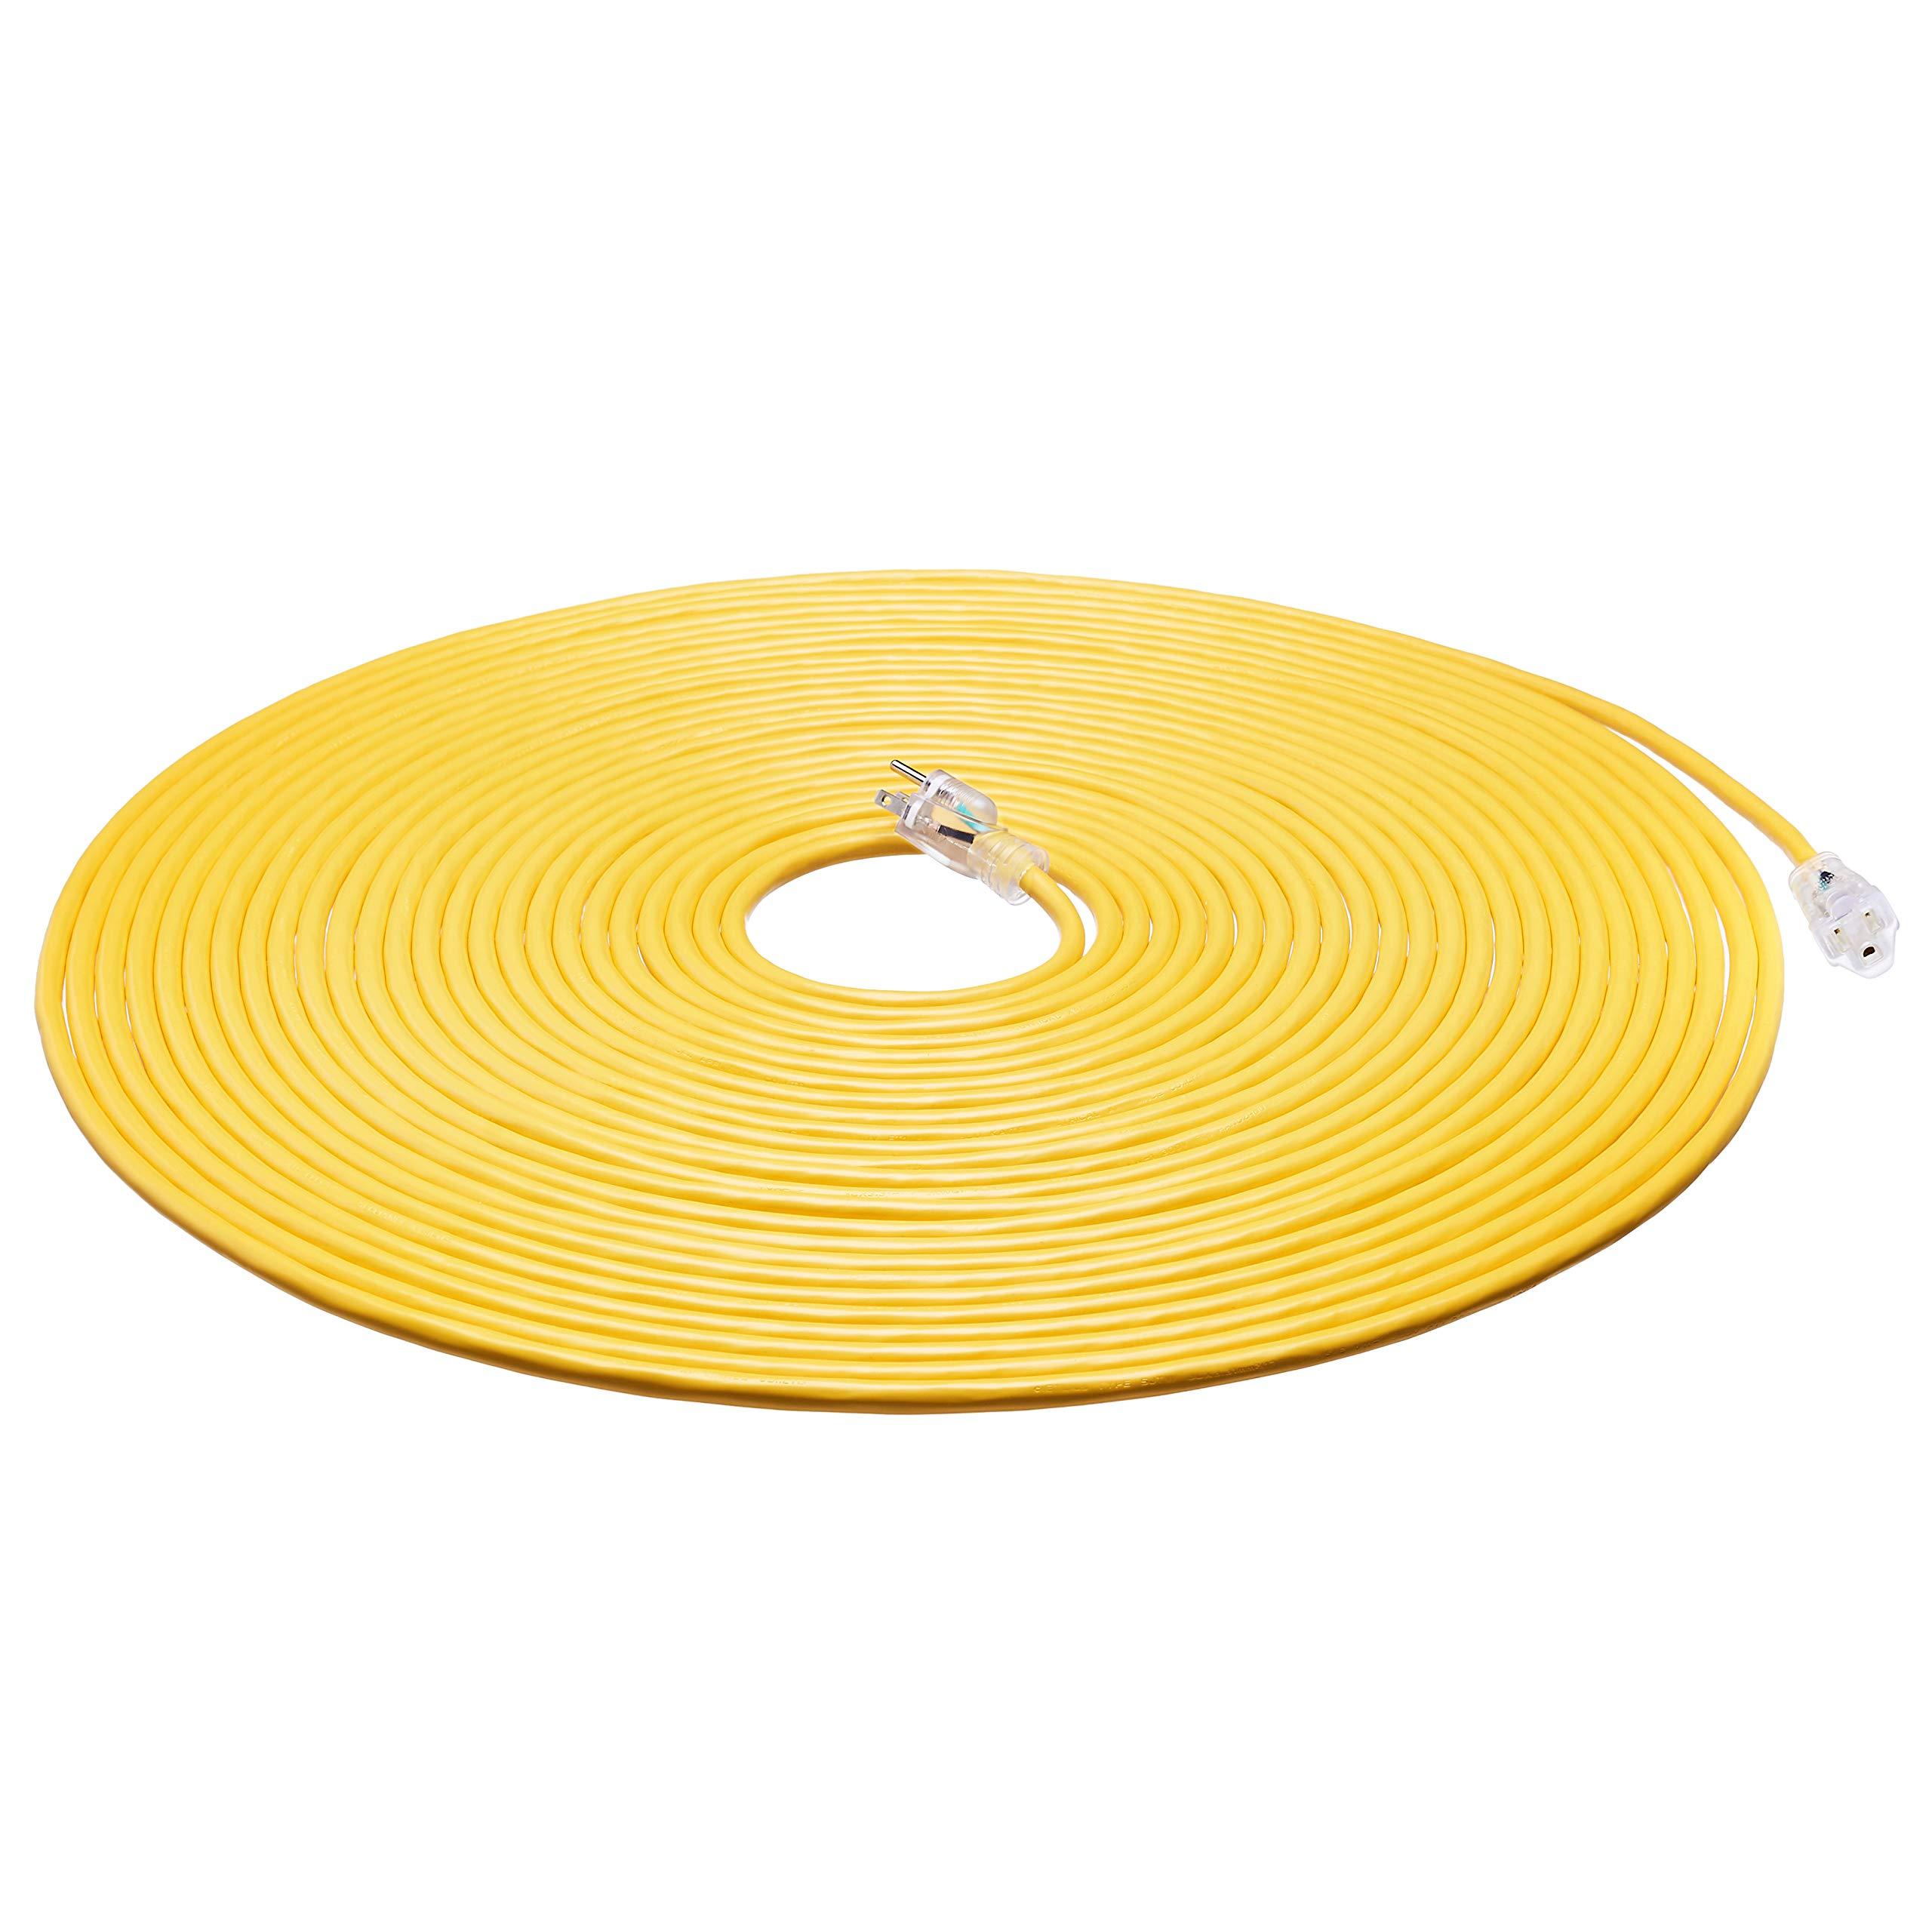 AmazonBasics 12/3 Heavy Duty SJTW Lighted Extension Cord, Yellow, 100 Foot